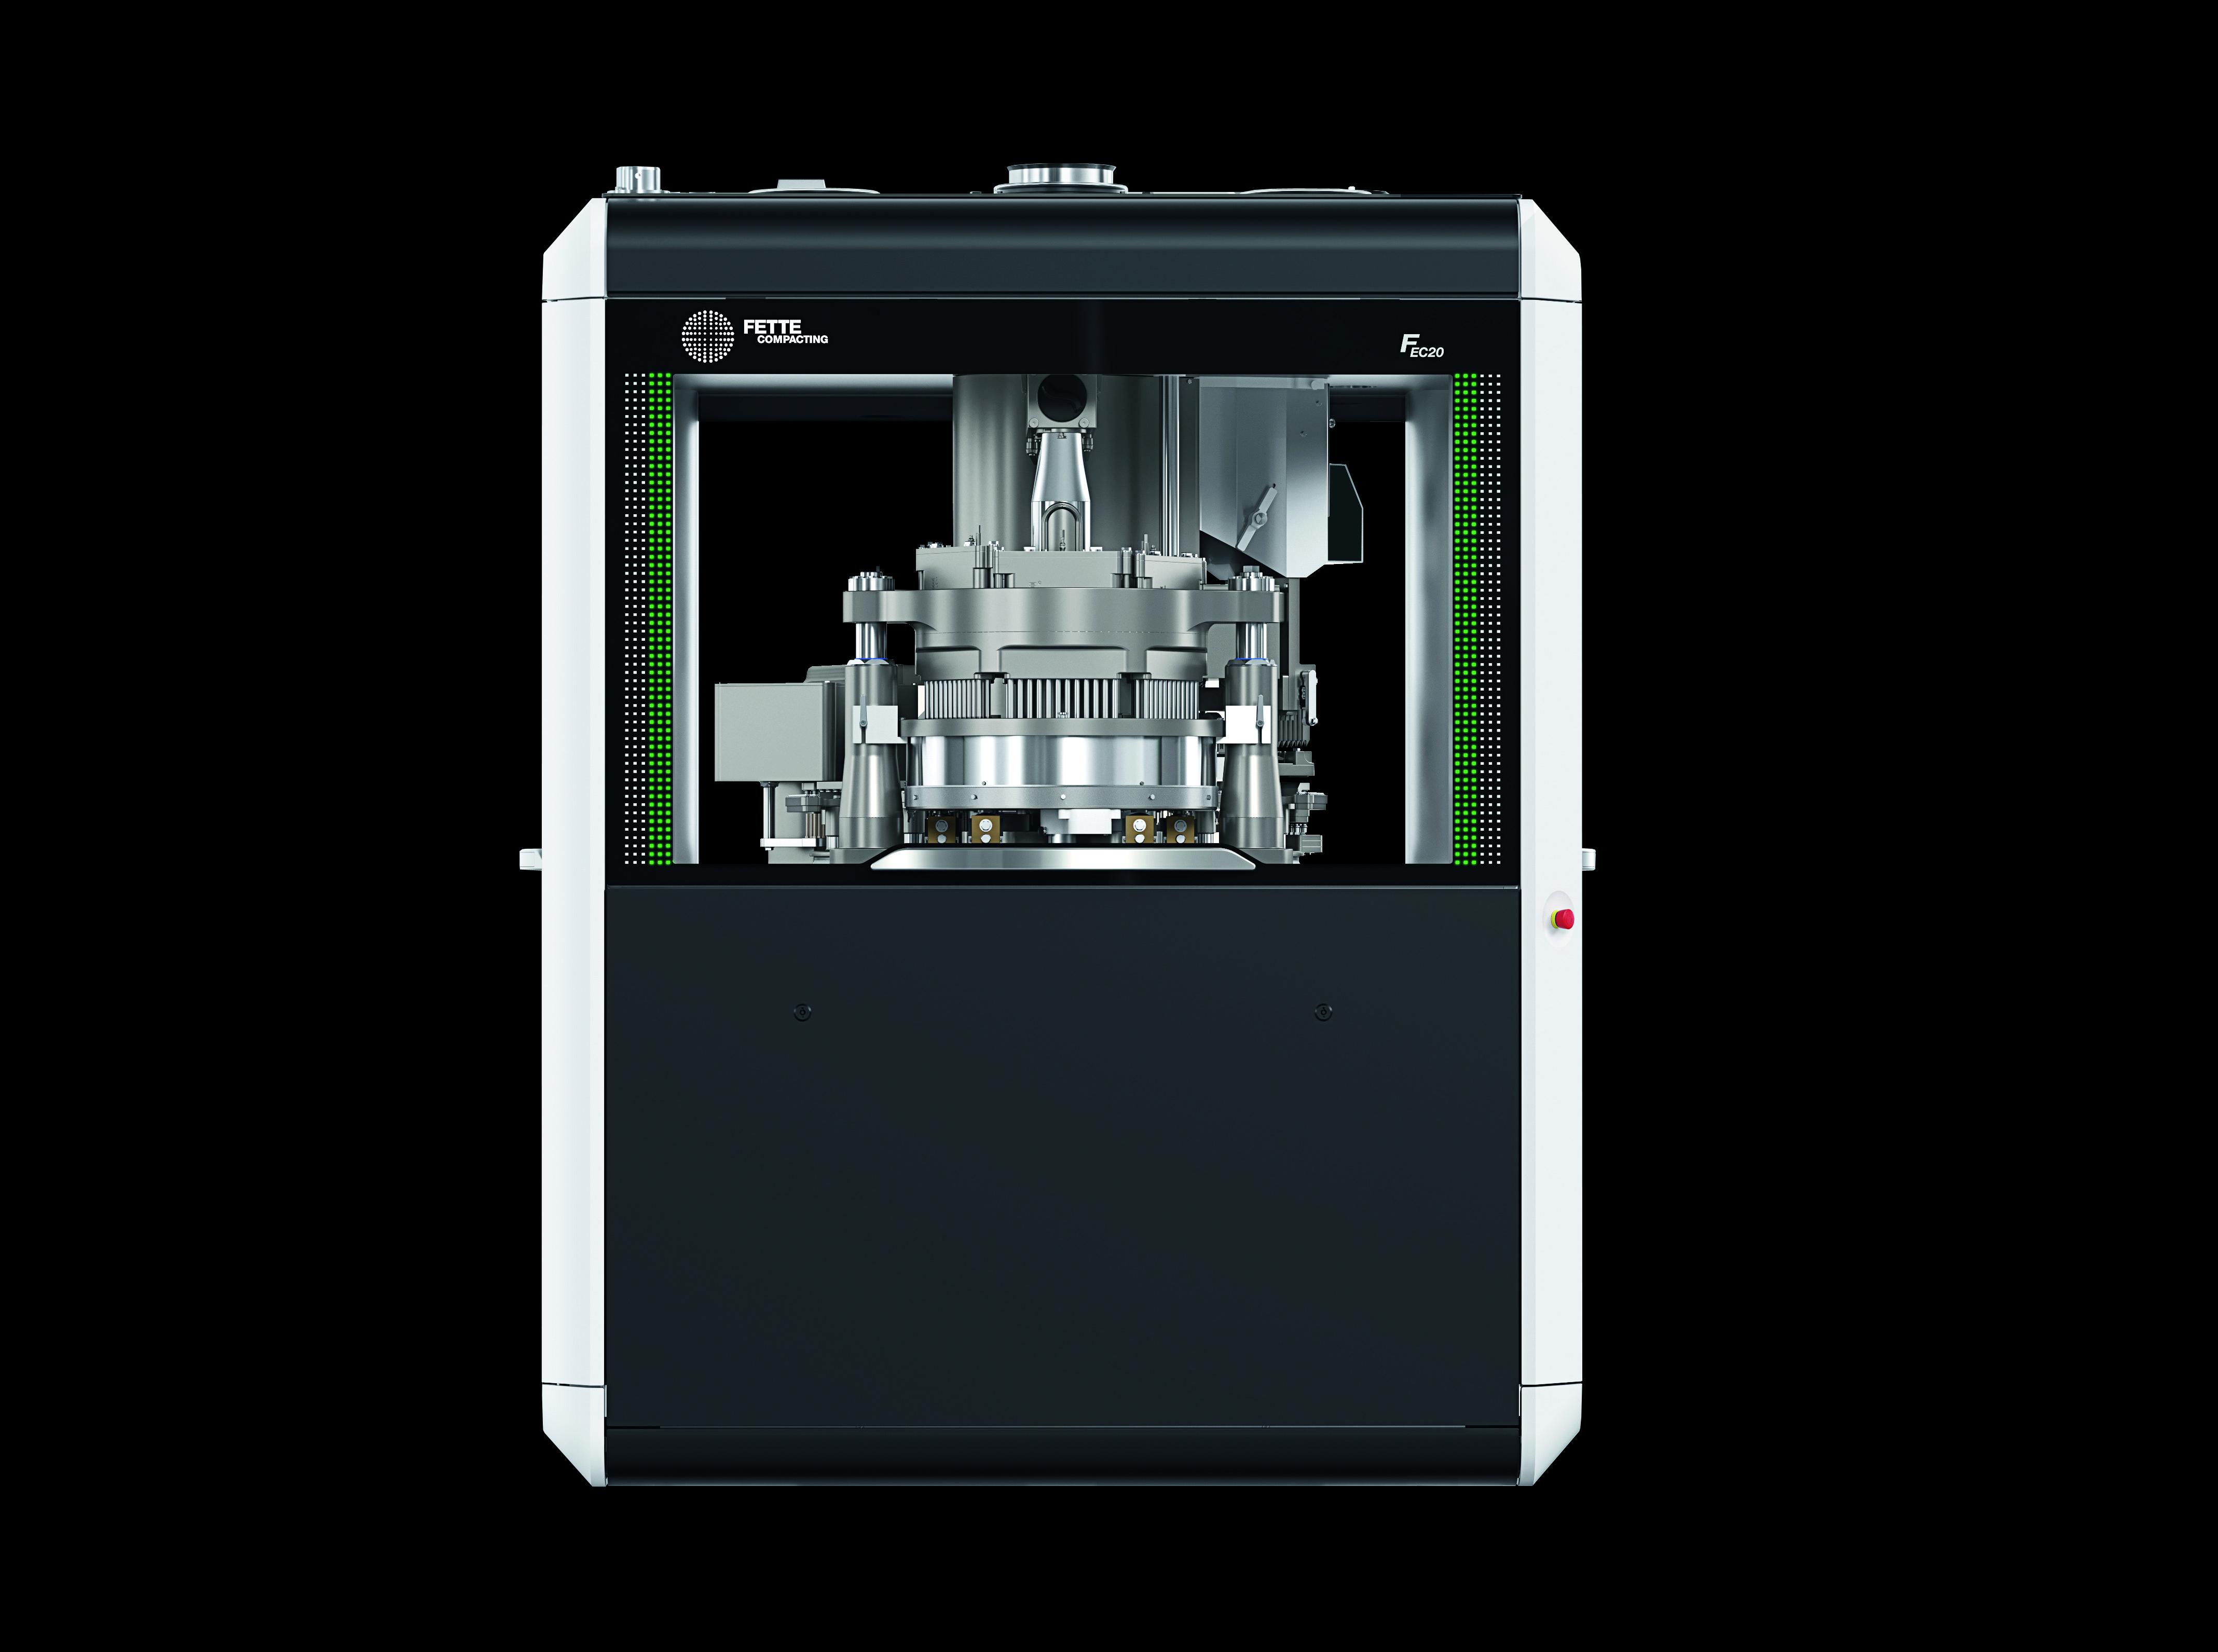 Weltpremiere – Fette Compacting stellt neue Kapselfüllmaschine FEC20 vor